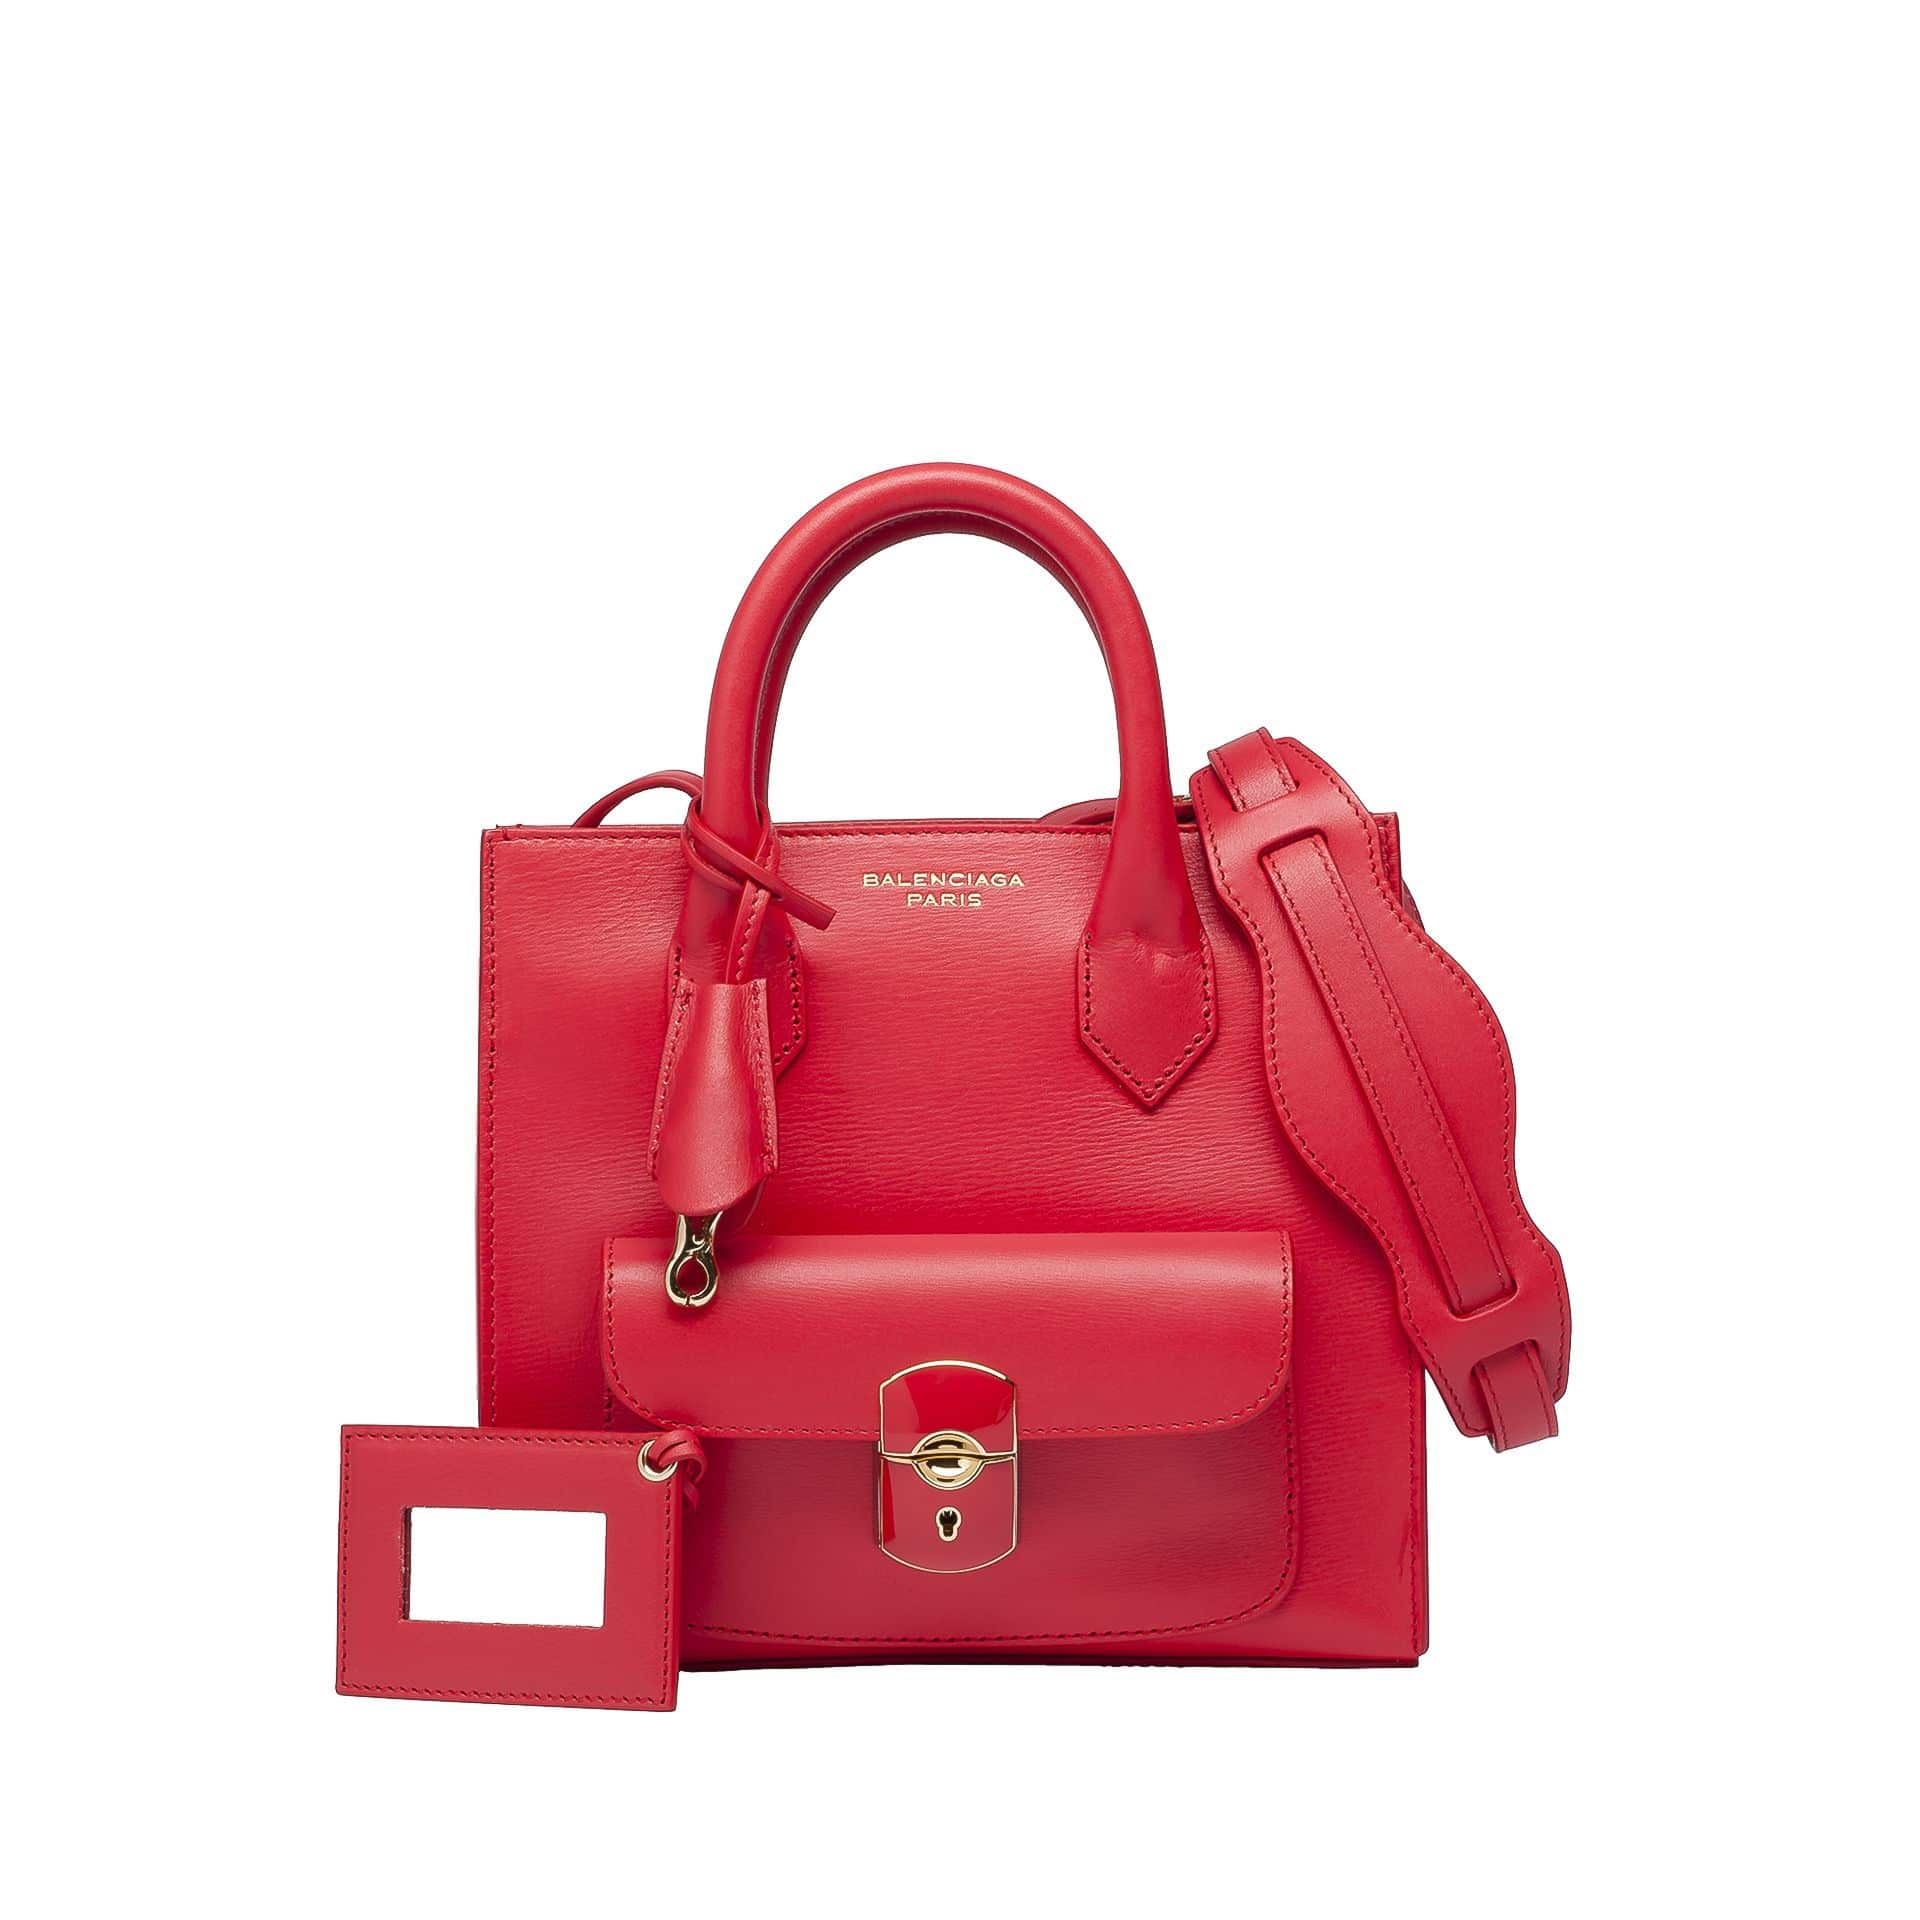 Balenciaga Cherry Red Mini Padlock All Afternoon Messenger Bag 1 295 00 Usd